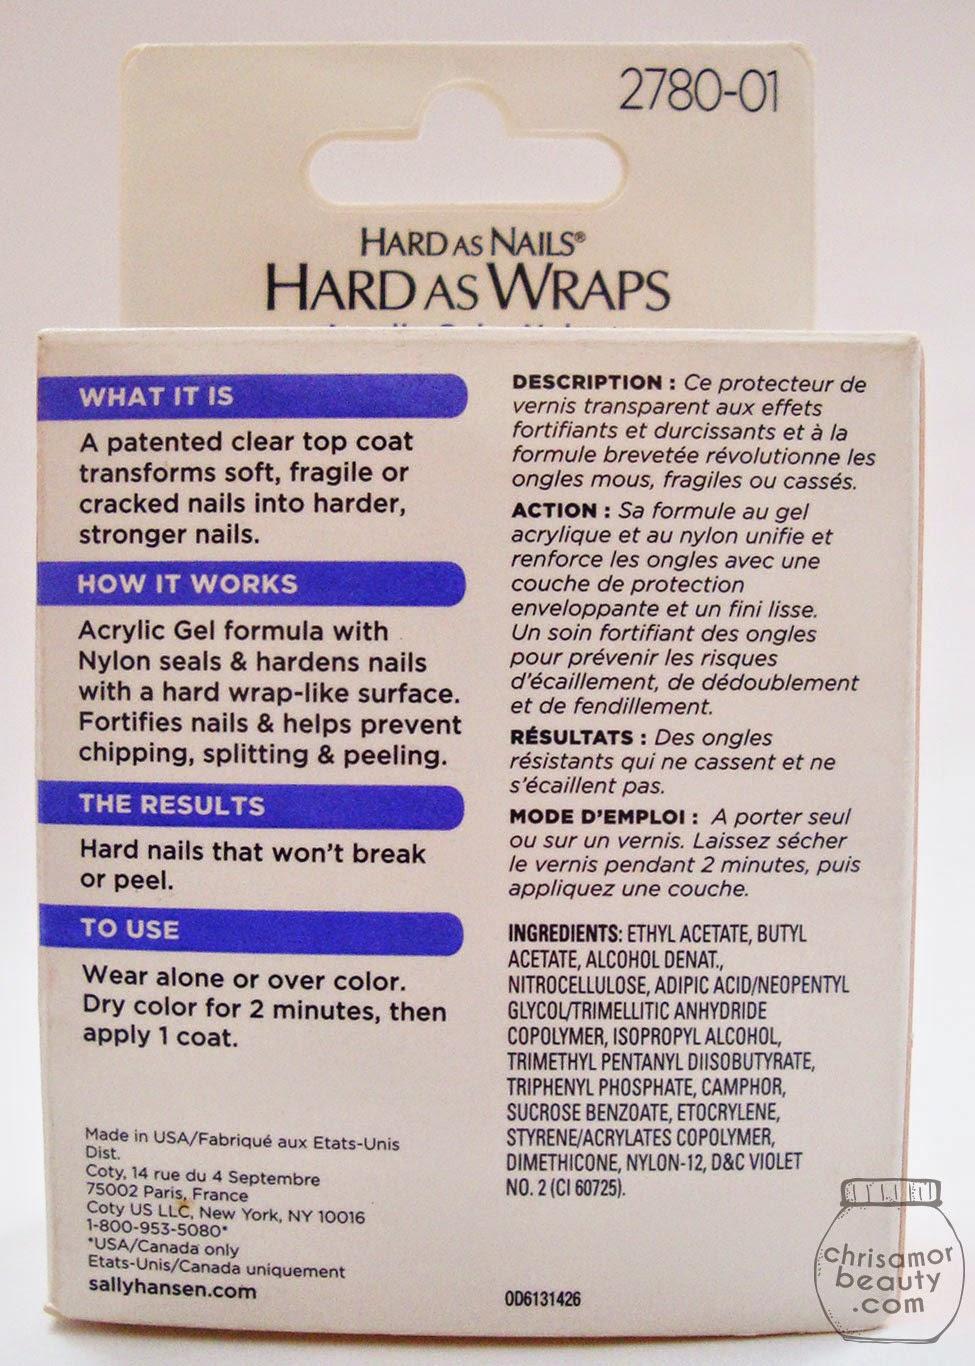 Chrisamor Goodie Jar : Sally Hansen Hard as Wraps saved my nails ...